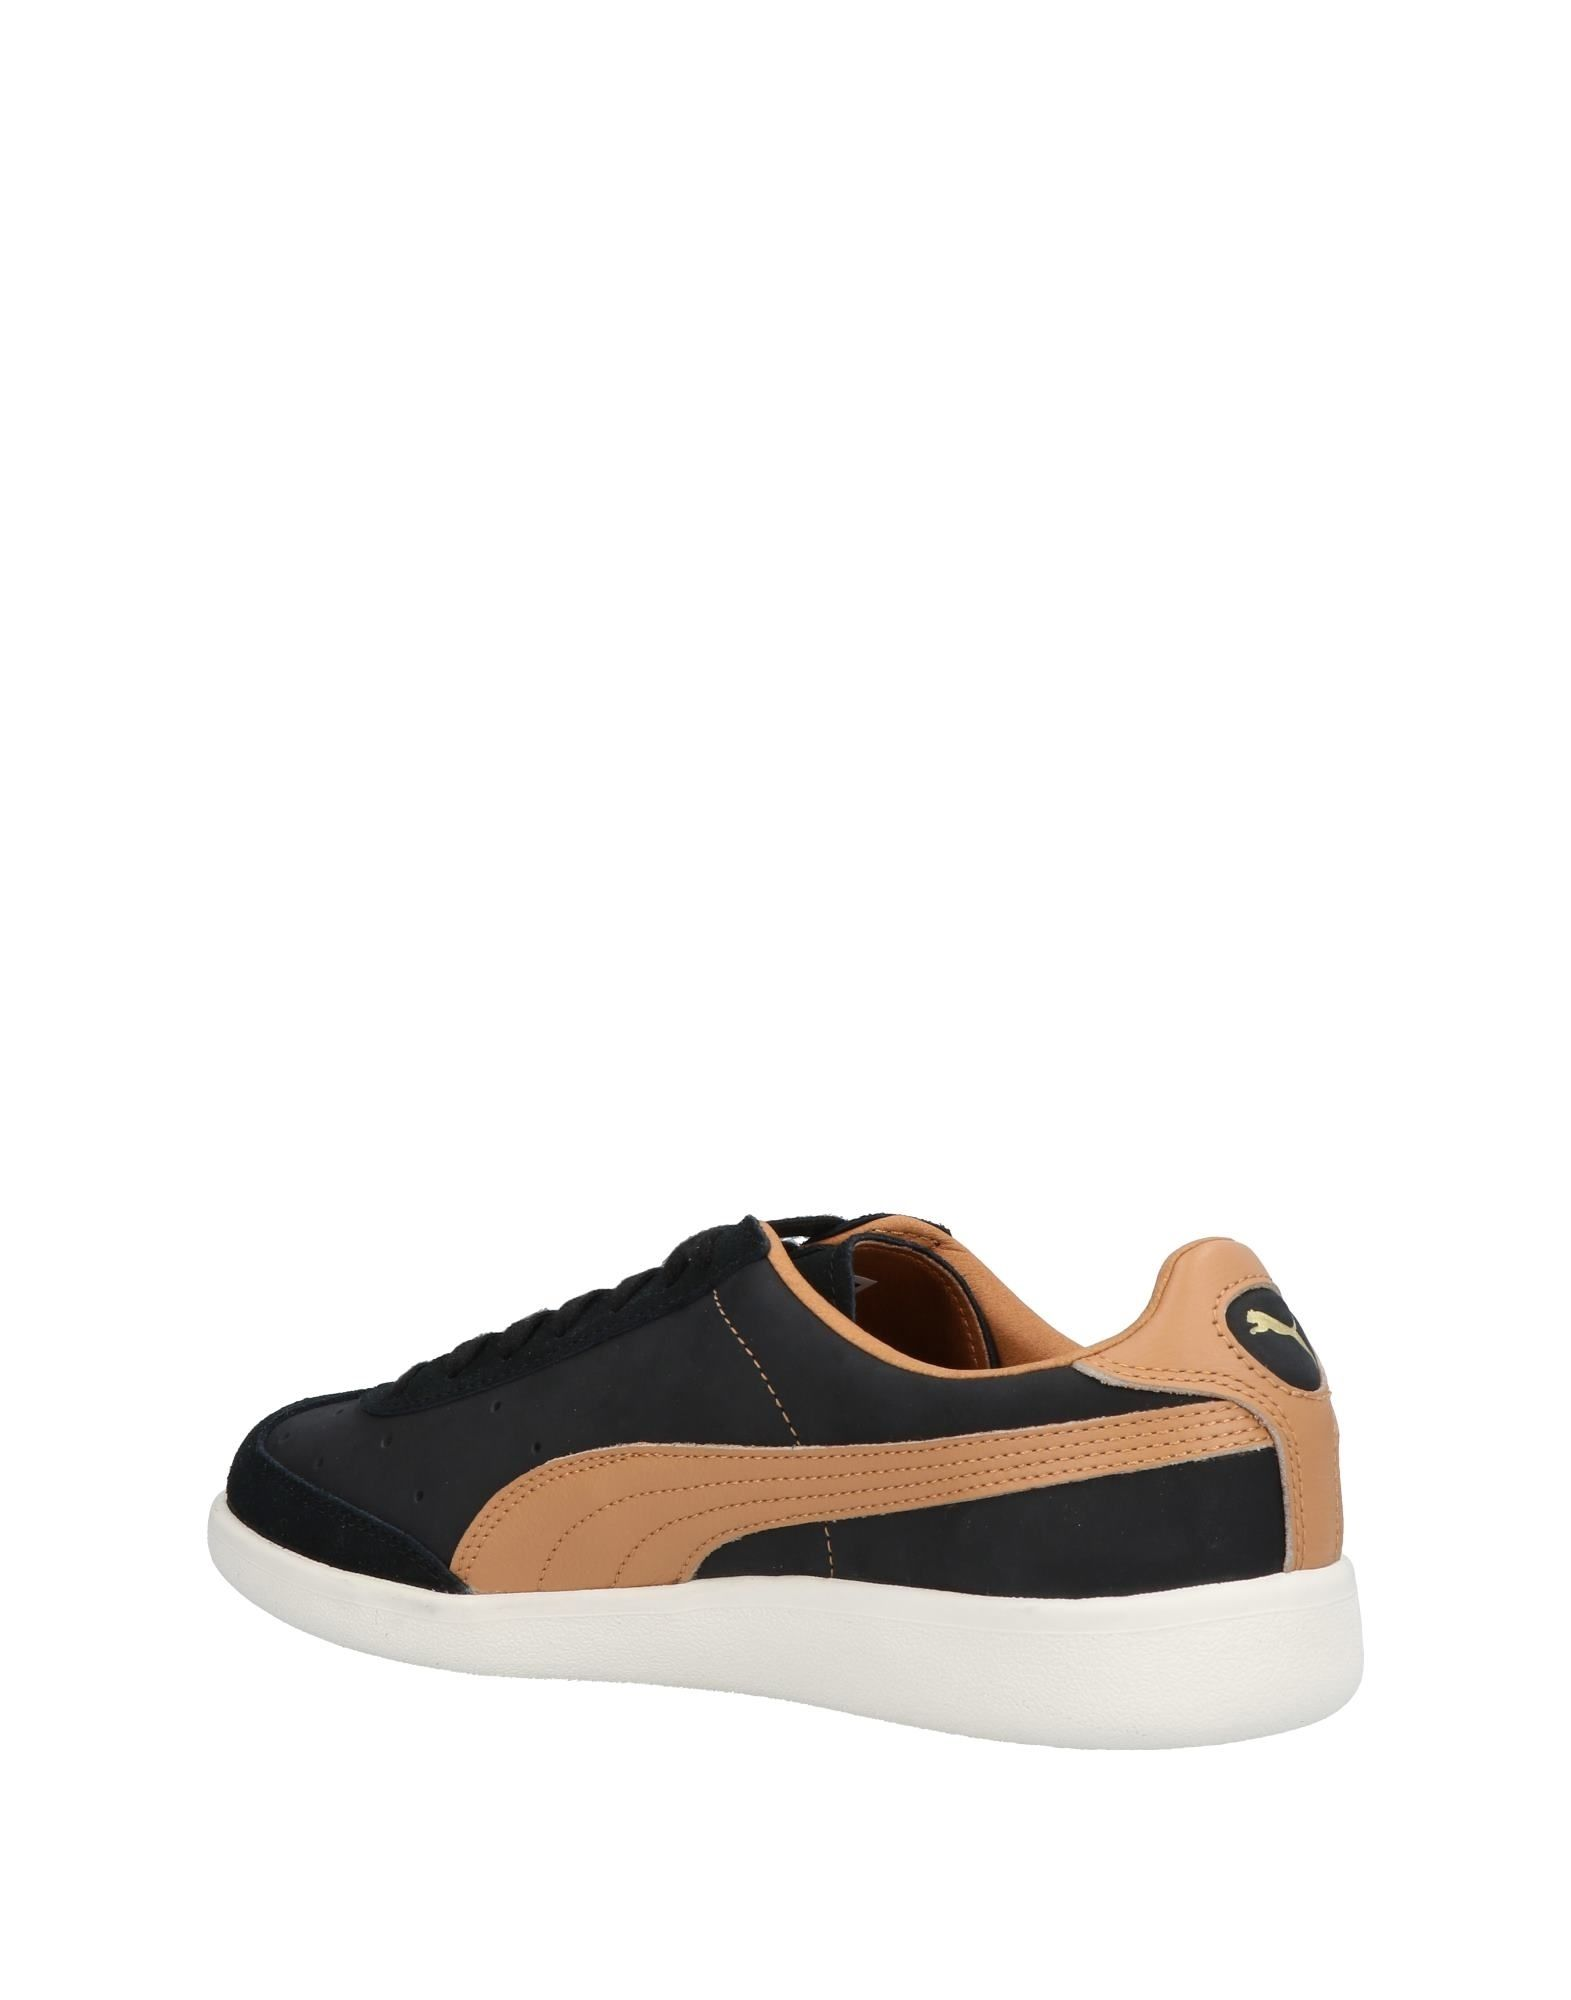 Puma Sneakers Herren  Heiße 11469629MO Heiße  Schuhe 6bde15